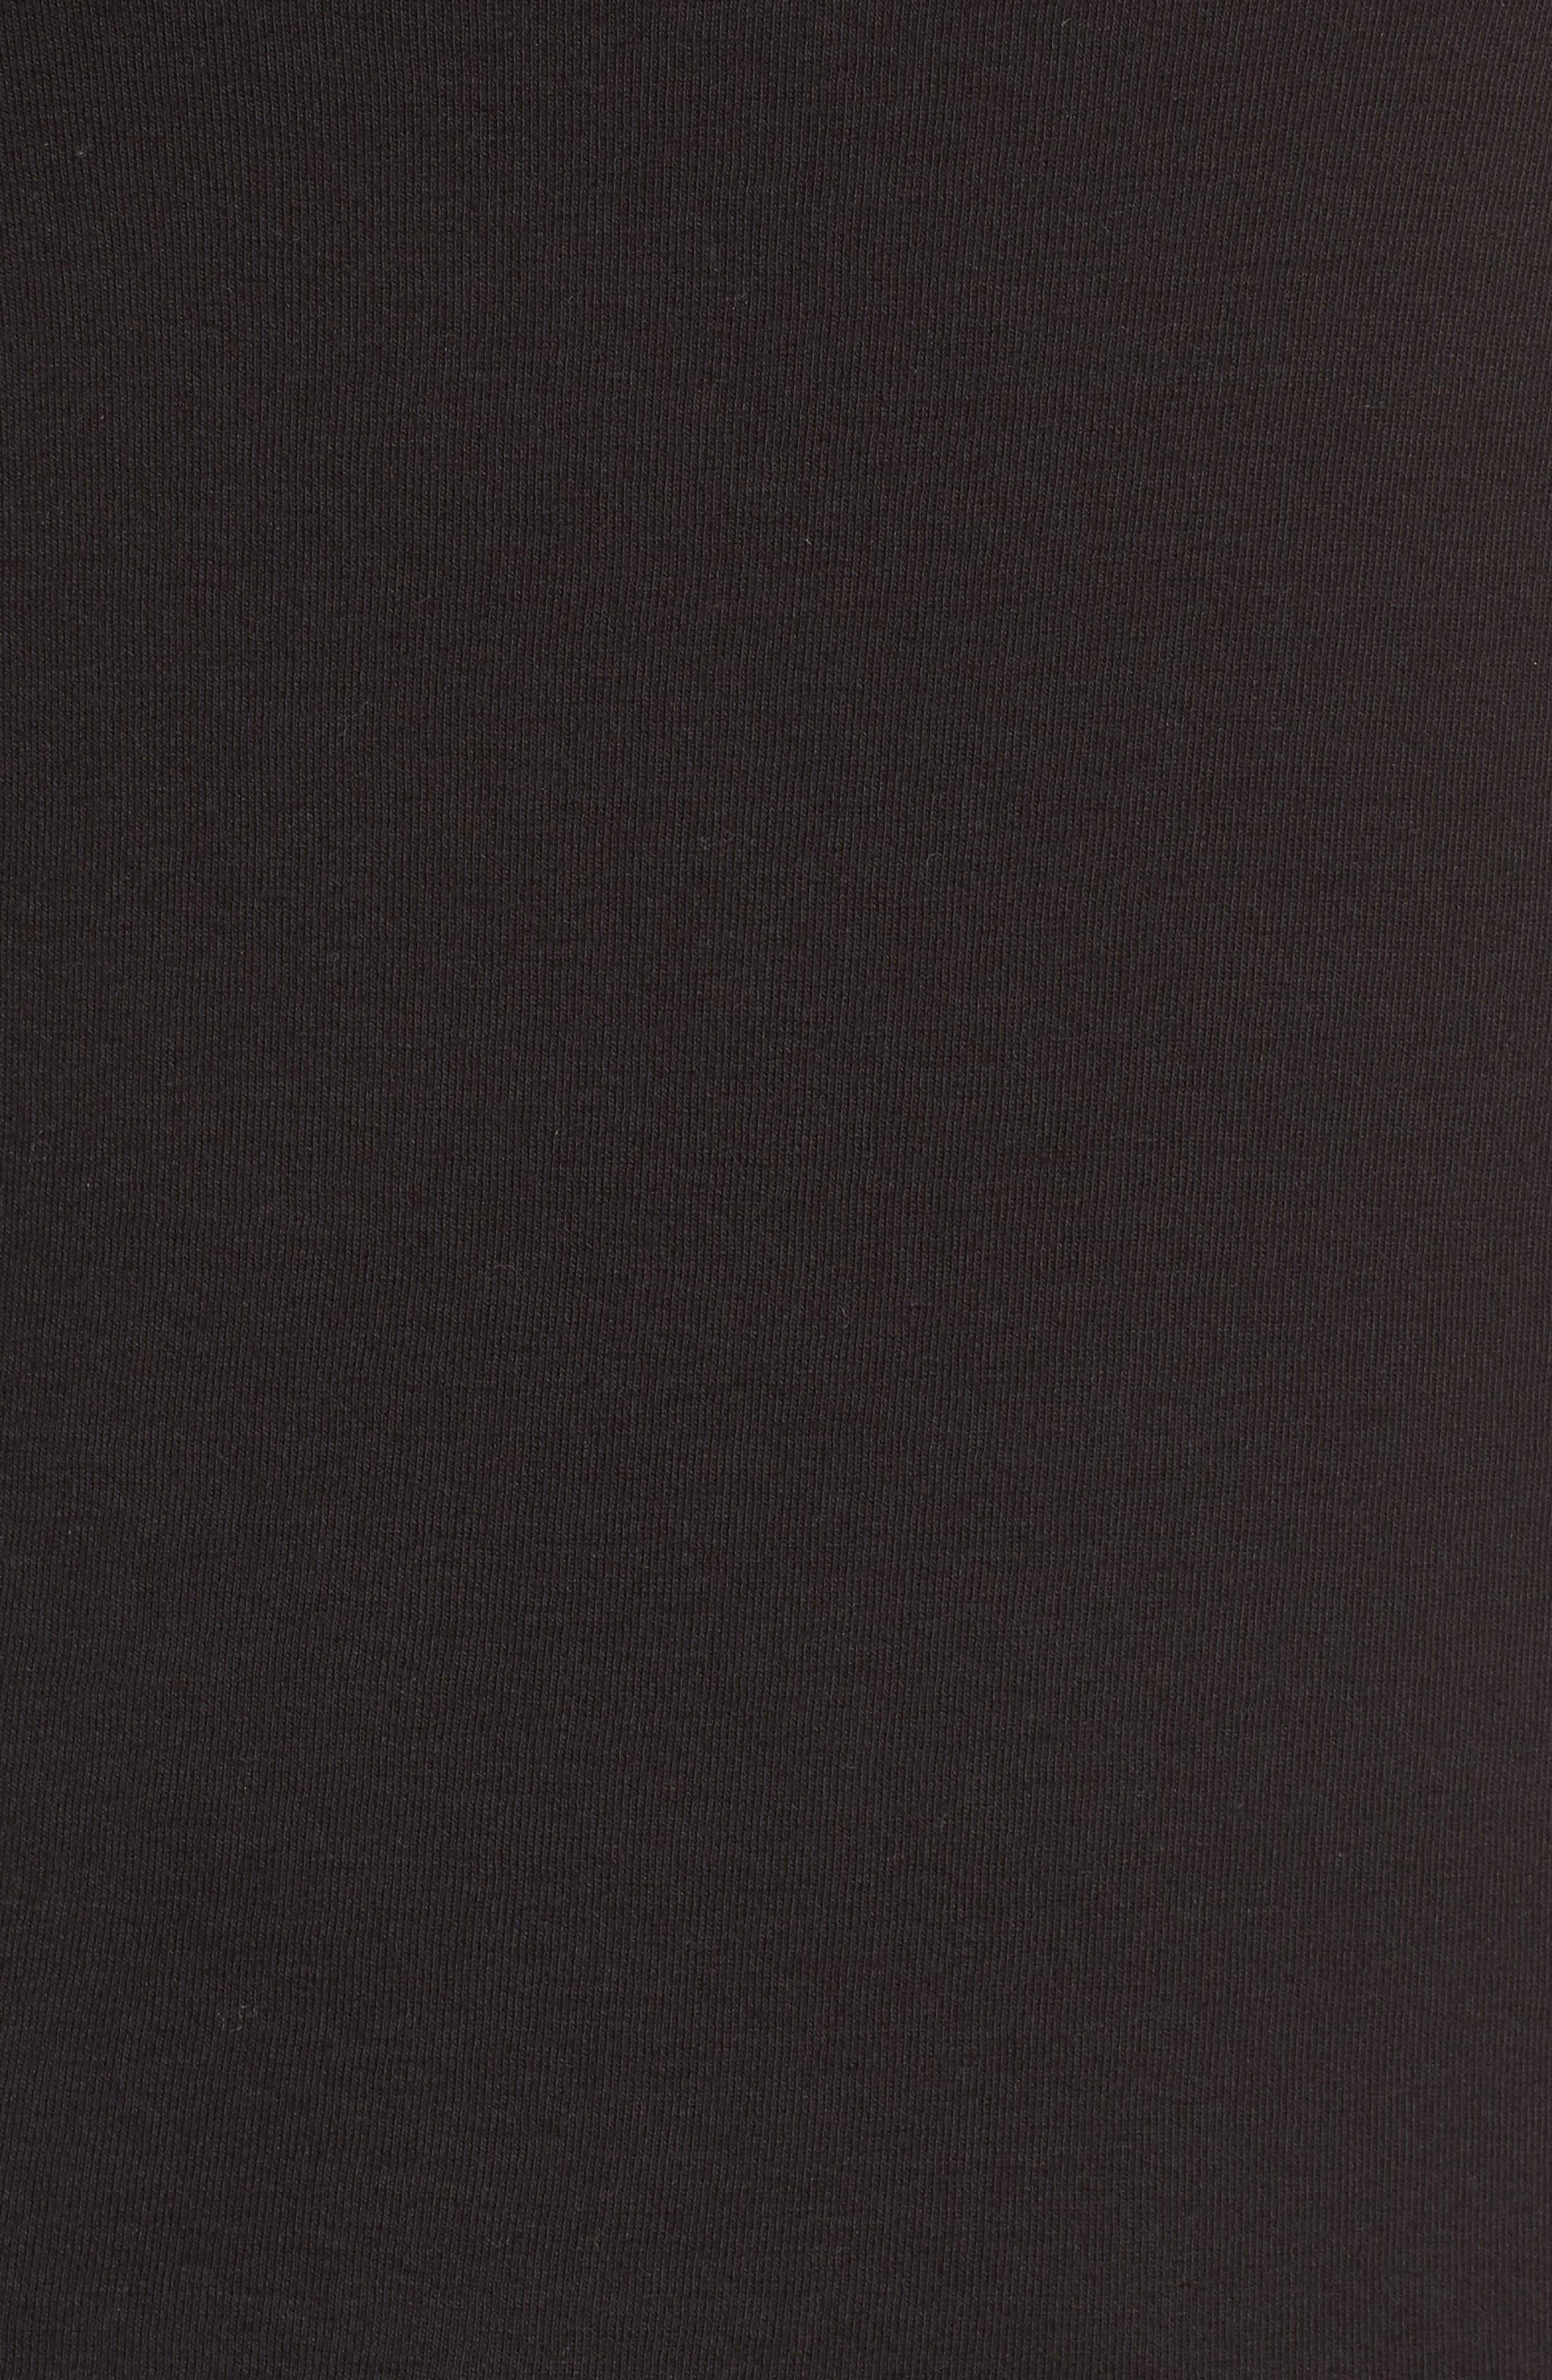 Caslon Cotton Tank,                             Alternate thumbnail 5, color,                             BLACK